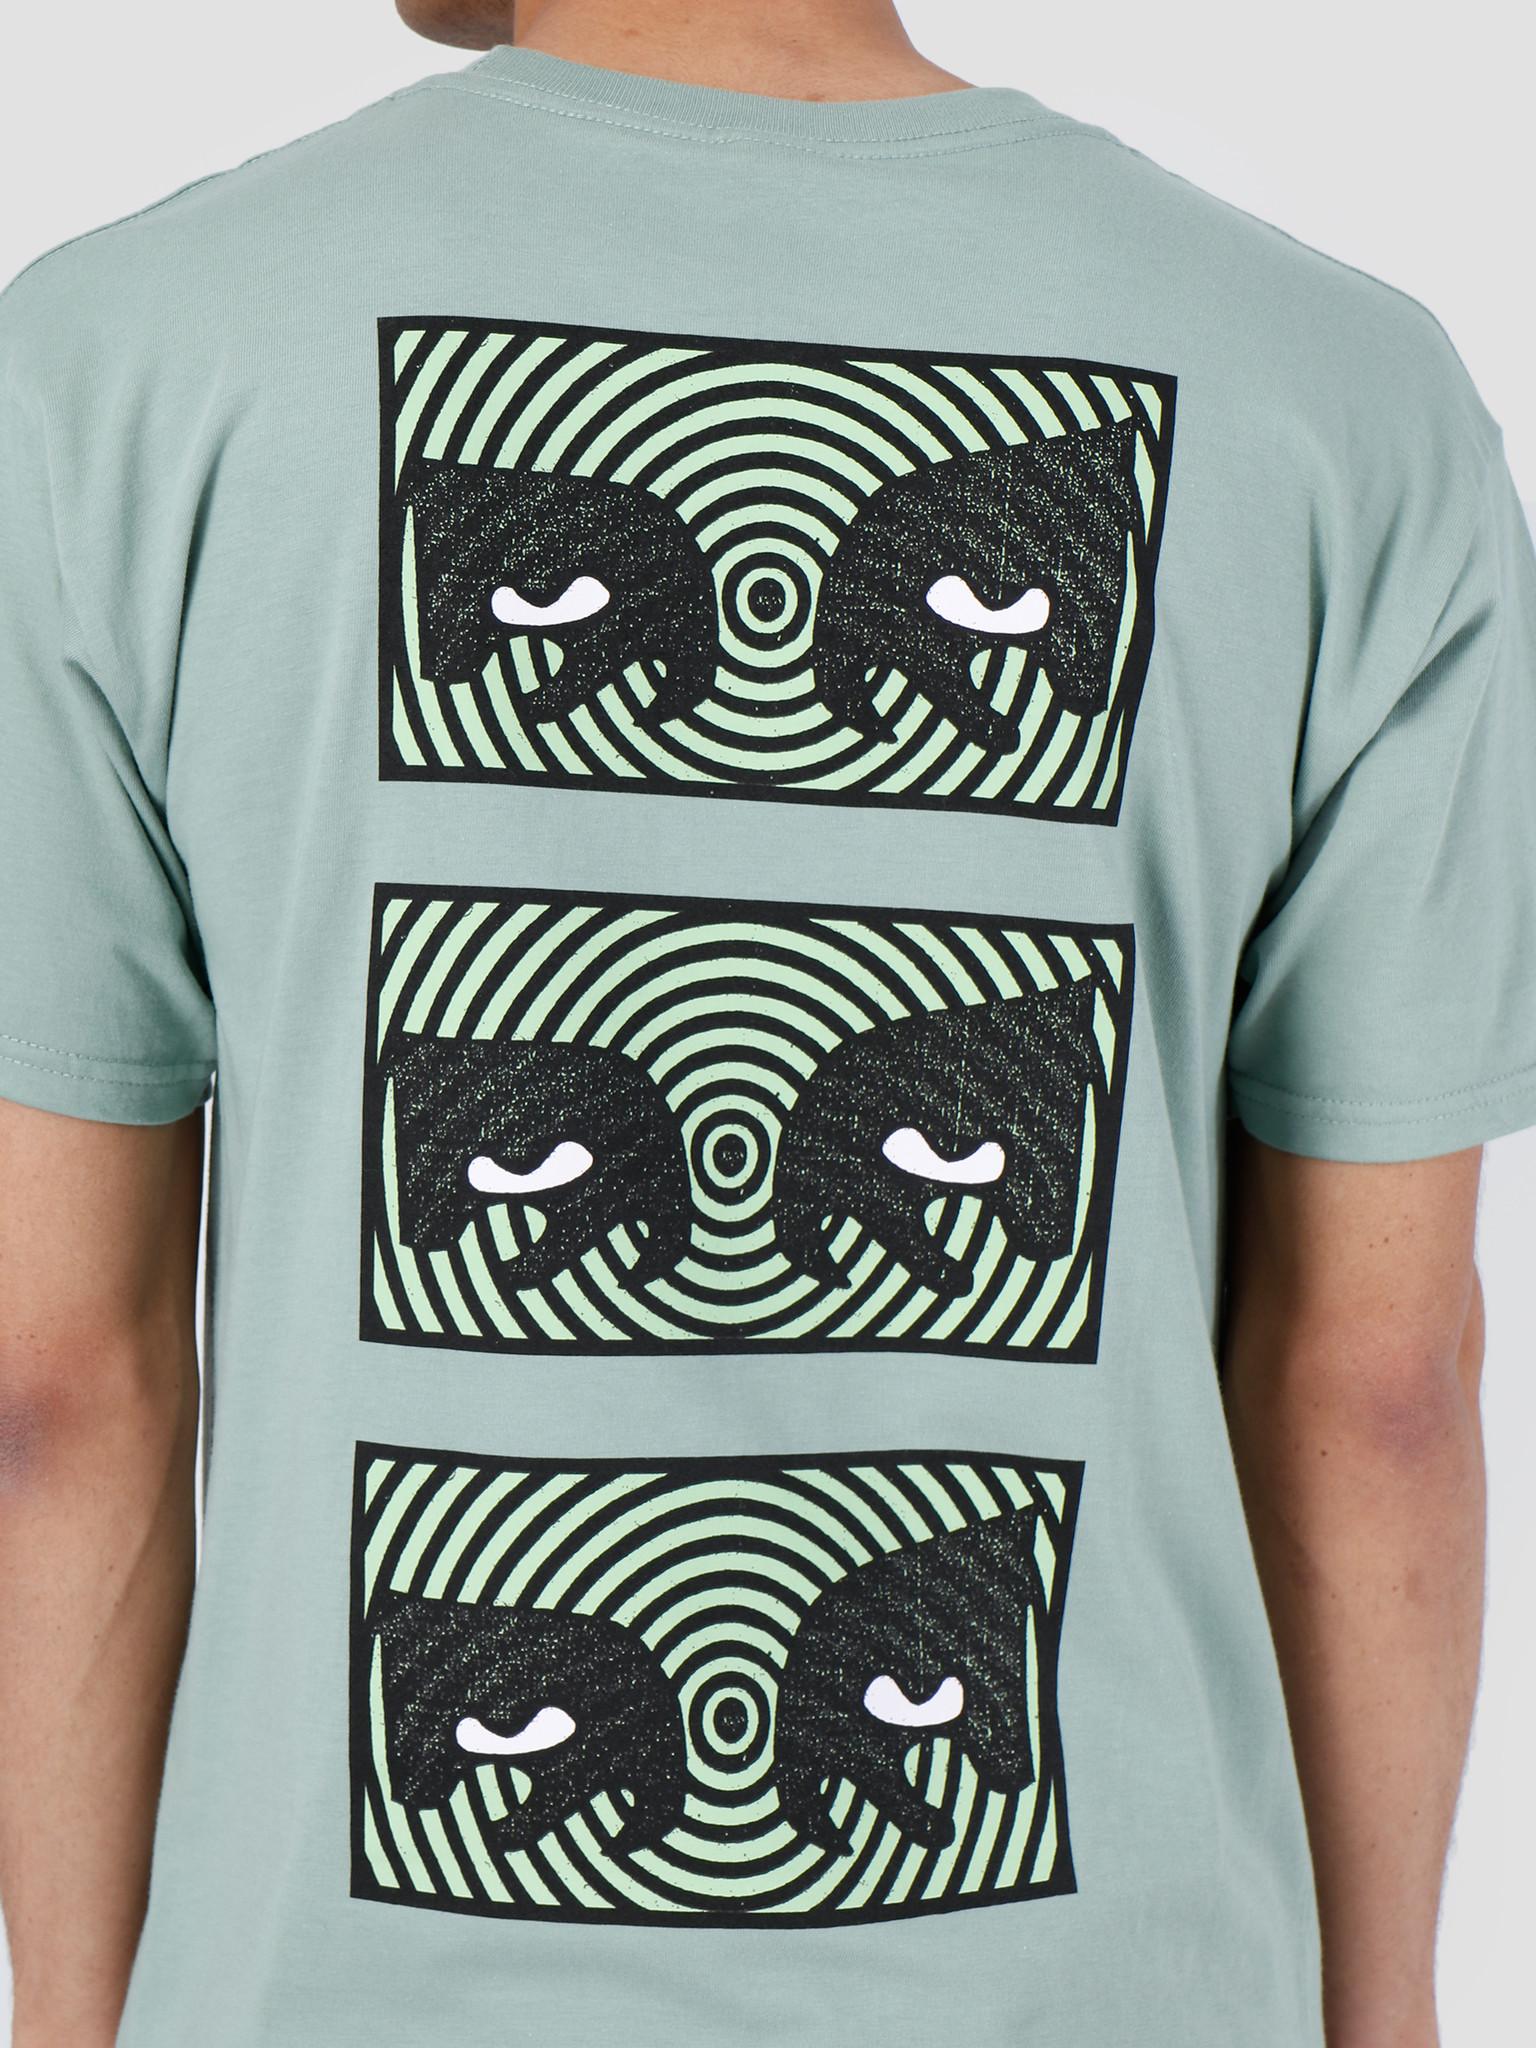 Obey Obey Bust Out Basic T-Shirt Sage 163081986-SAG